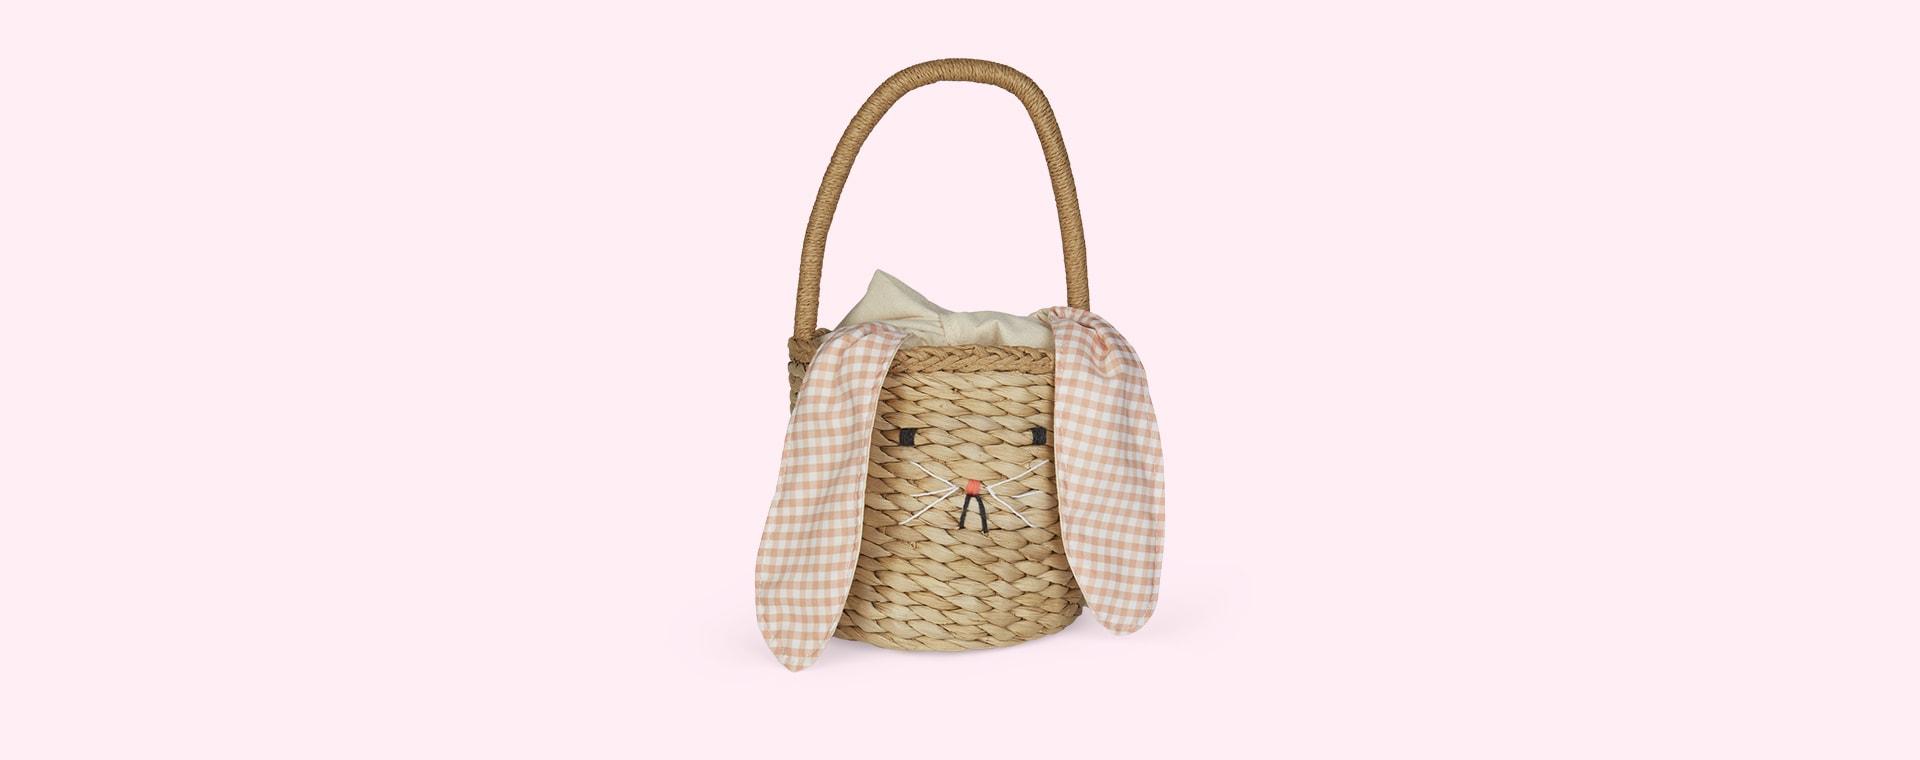 Neutral Meri Meri Bunny Woven Straw Bag